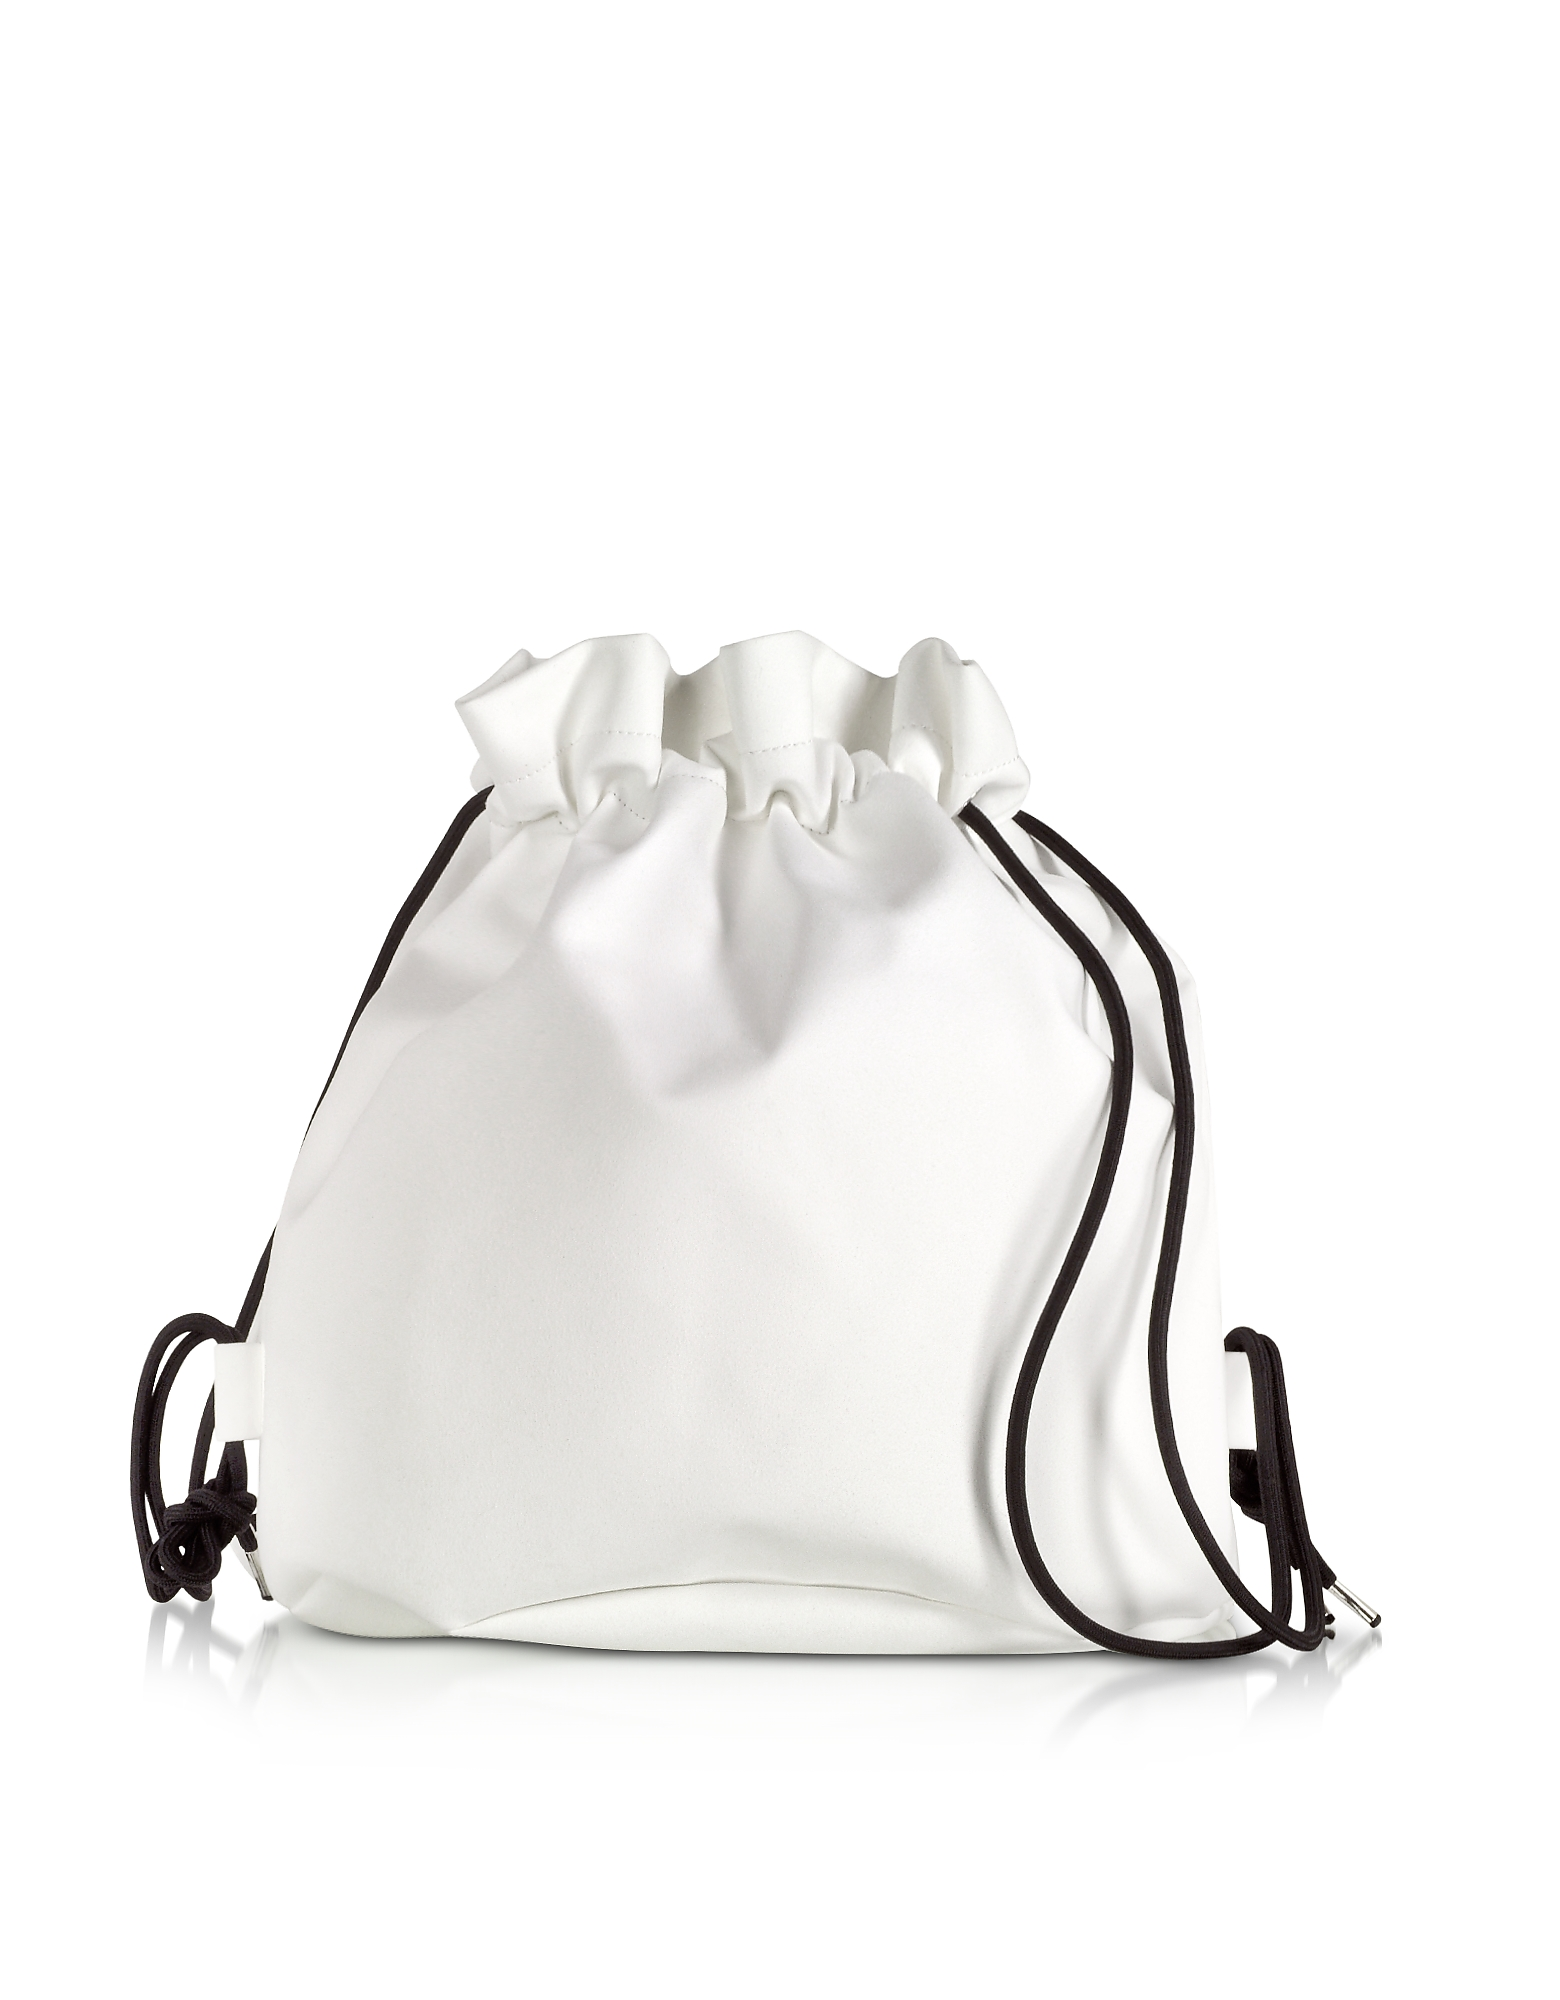 MM6 Maison Martin Margiela Designer Handbags, White Drawstring Backpack w/ Metal Handle